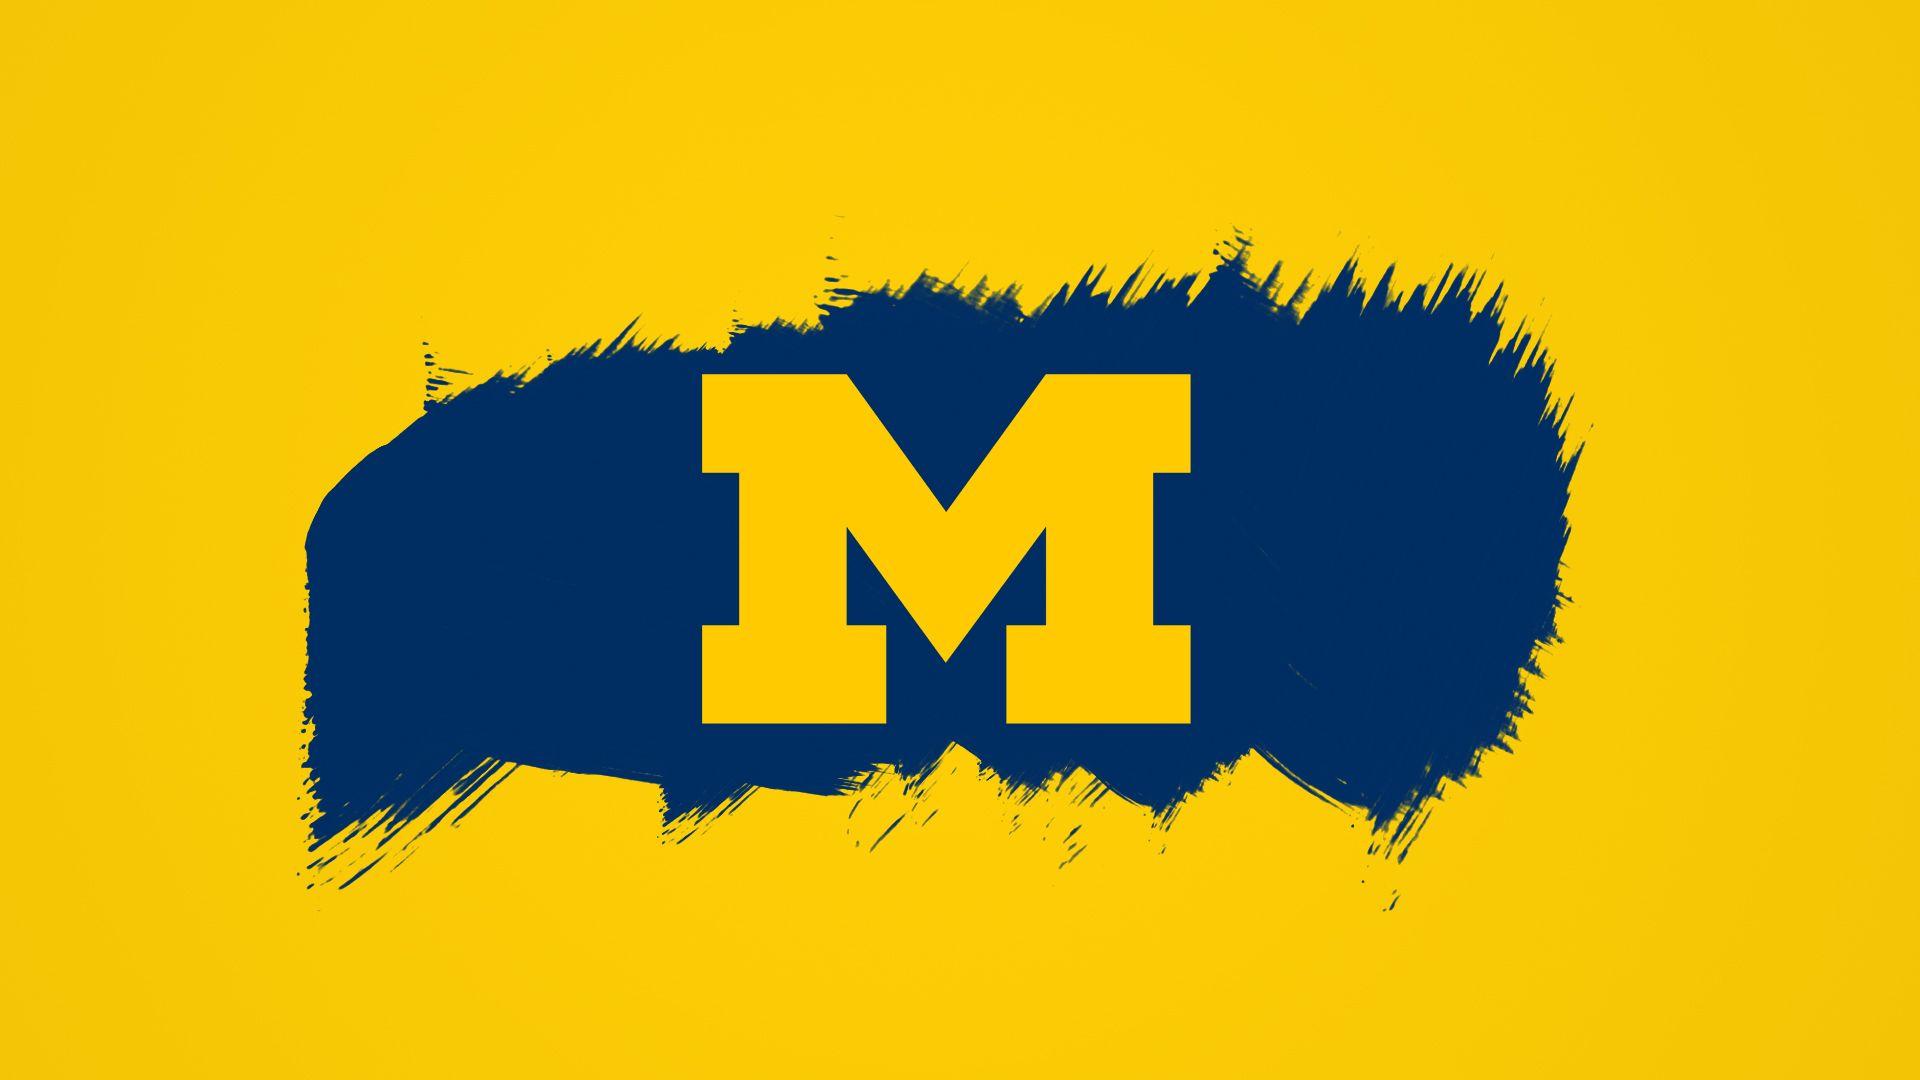 The University of Michigan Wallpaper Border Wallpaper Border